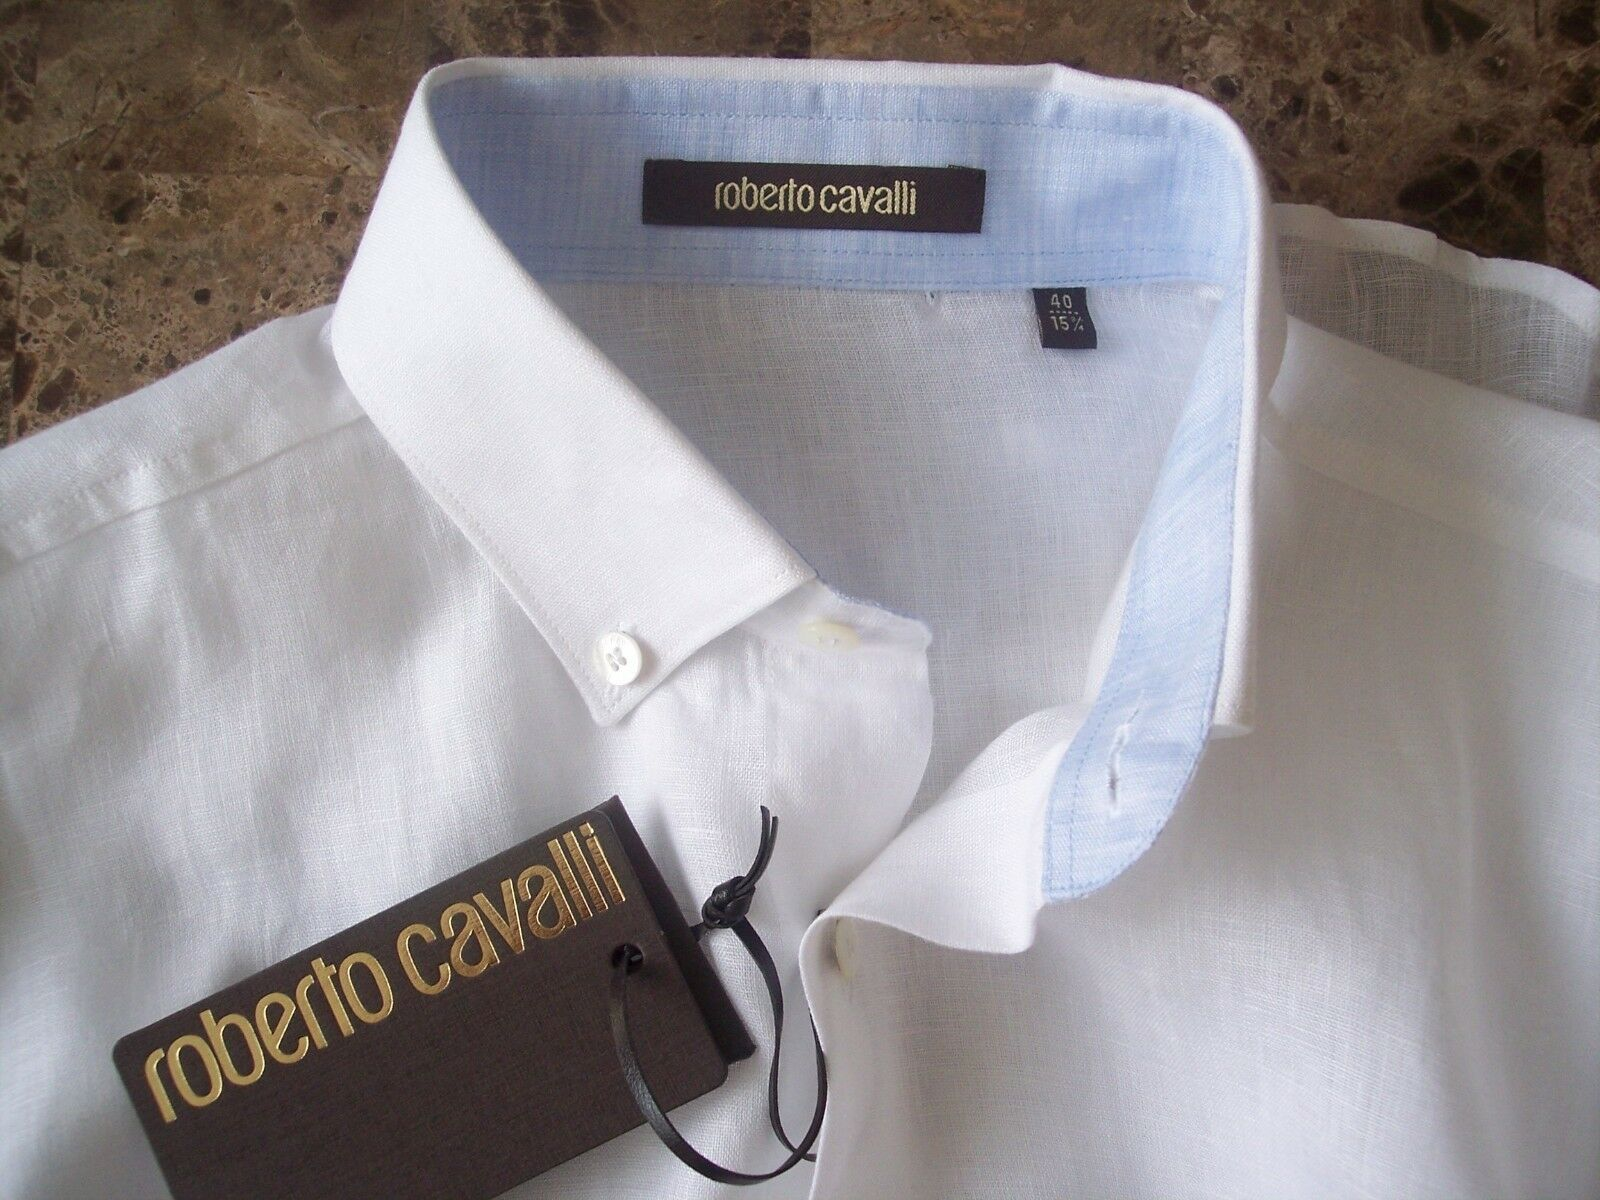 New Authentic ROBERTO CAVALLI Logo Linen Shirt 40 - 15 3 4 ..